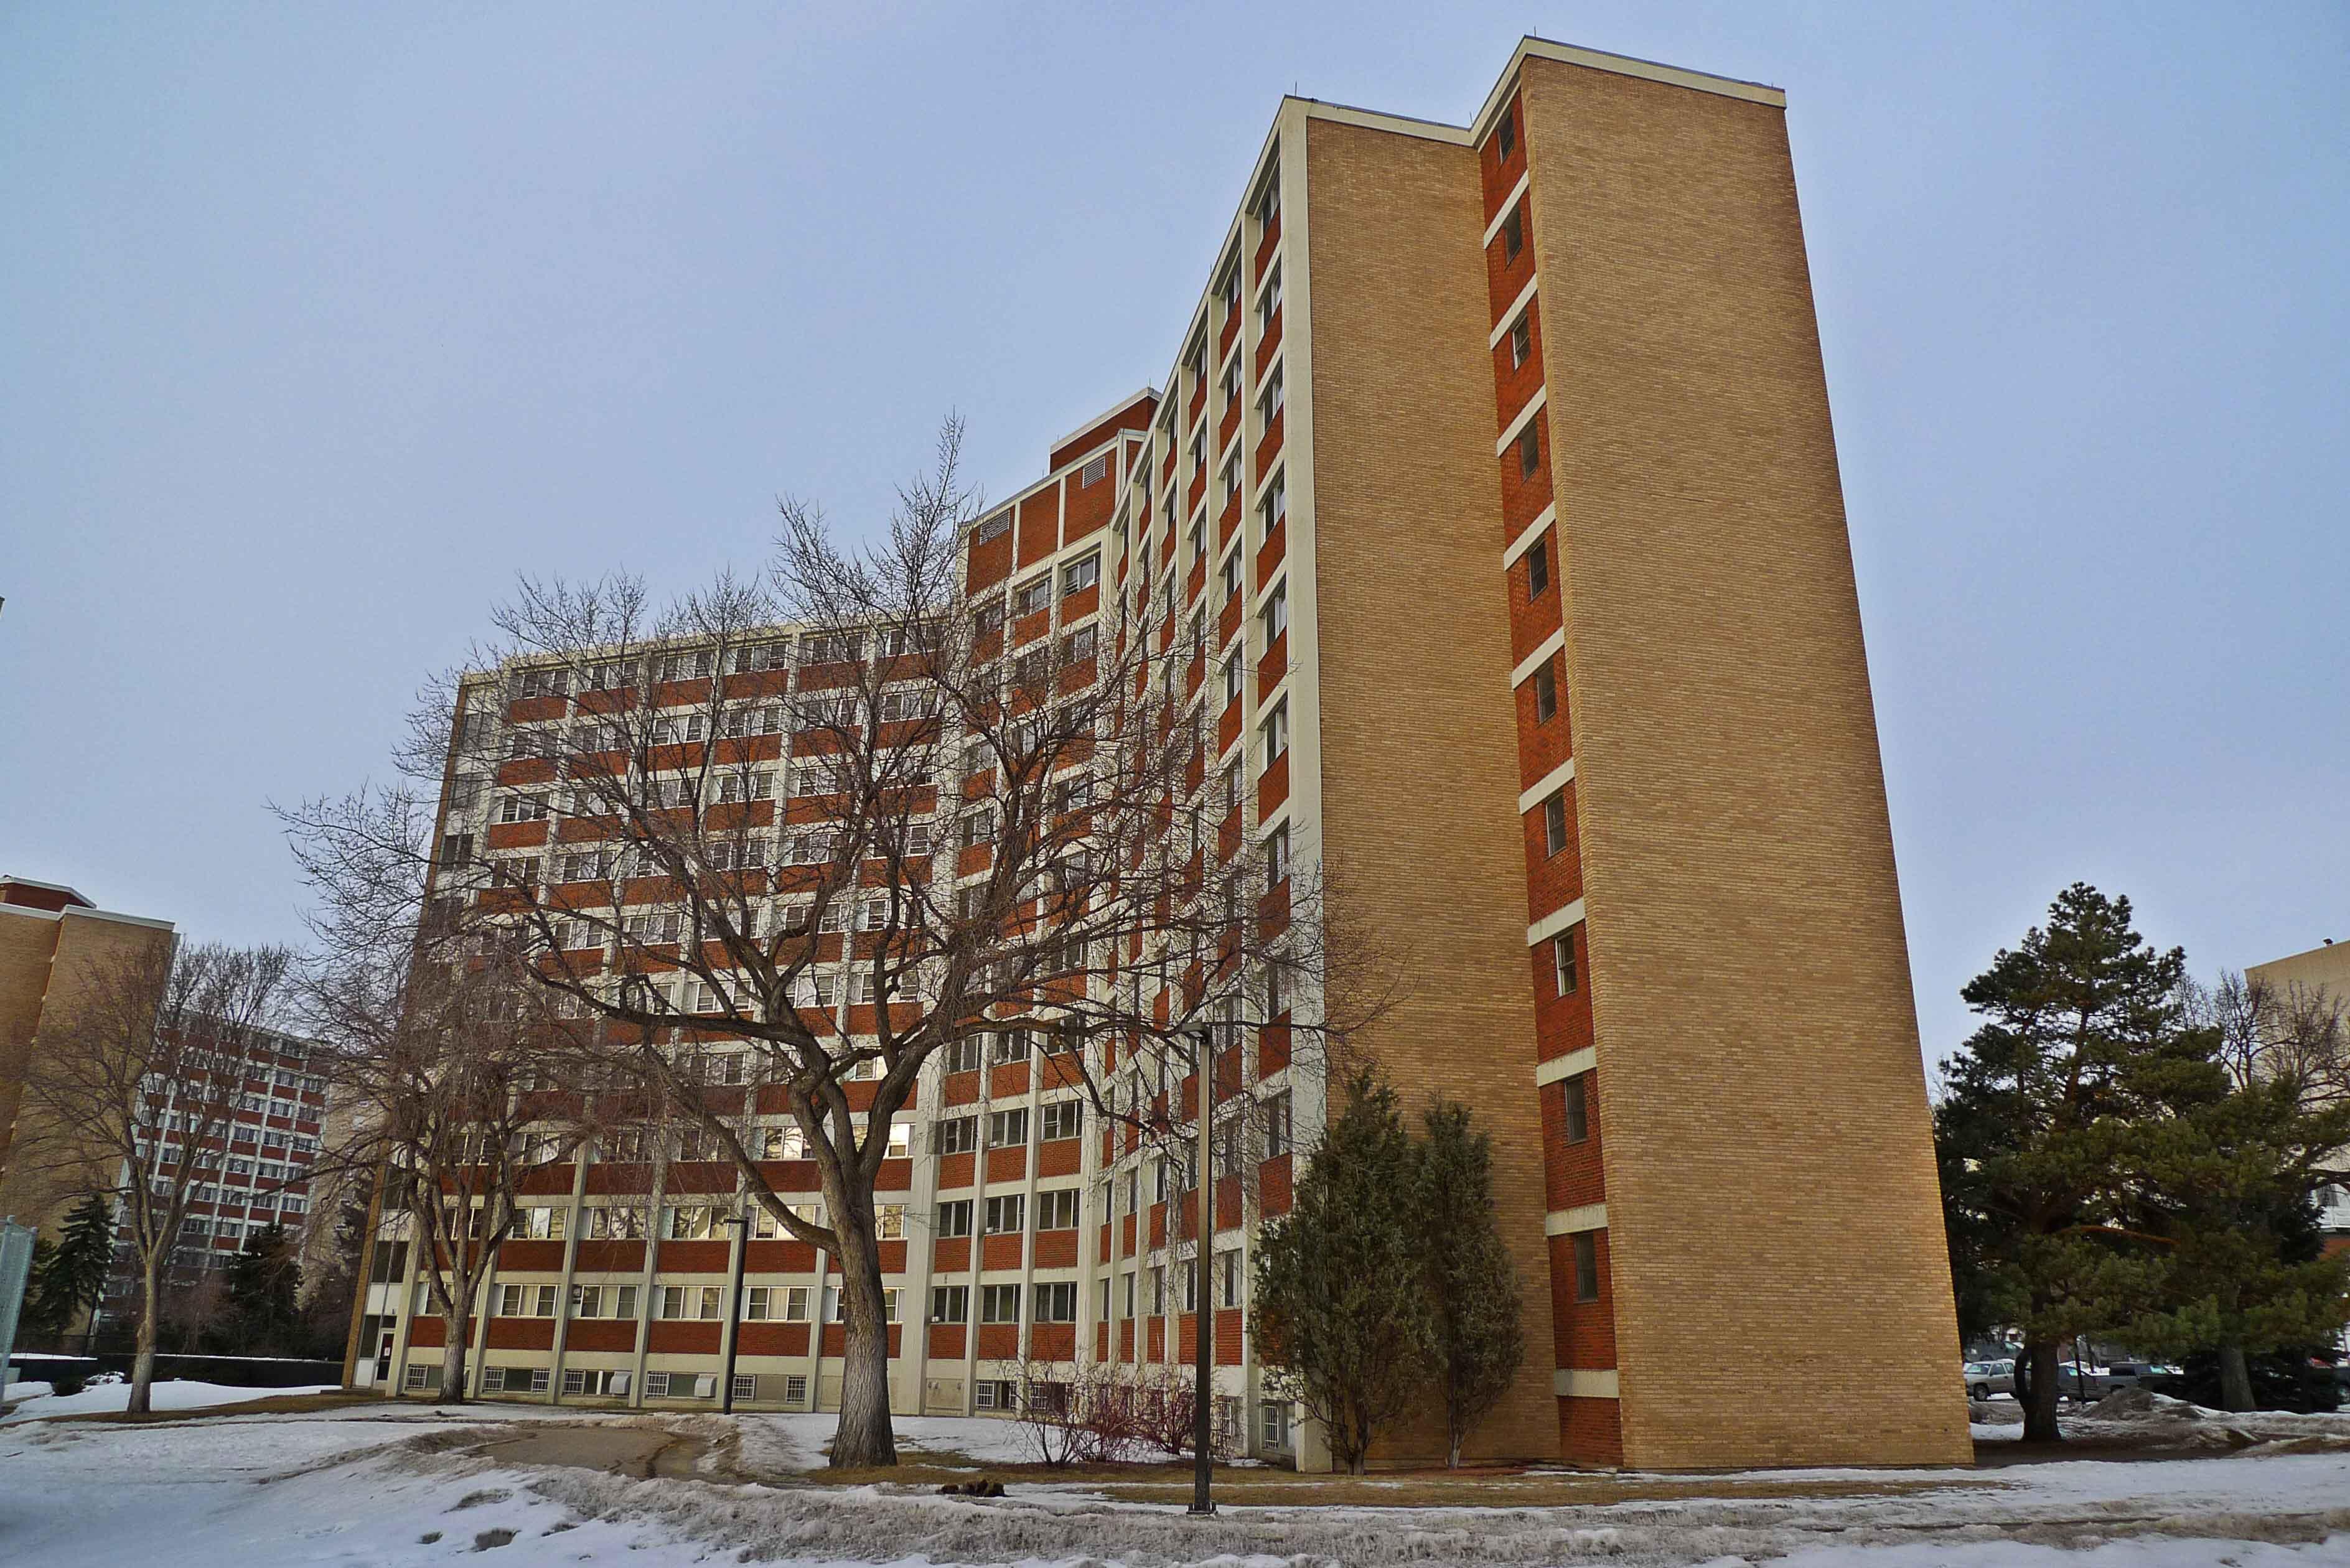 UofA, U of A Lister Hall in Edmonton